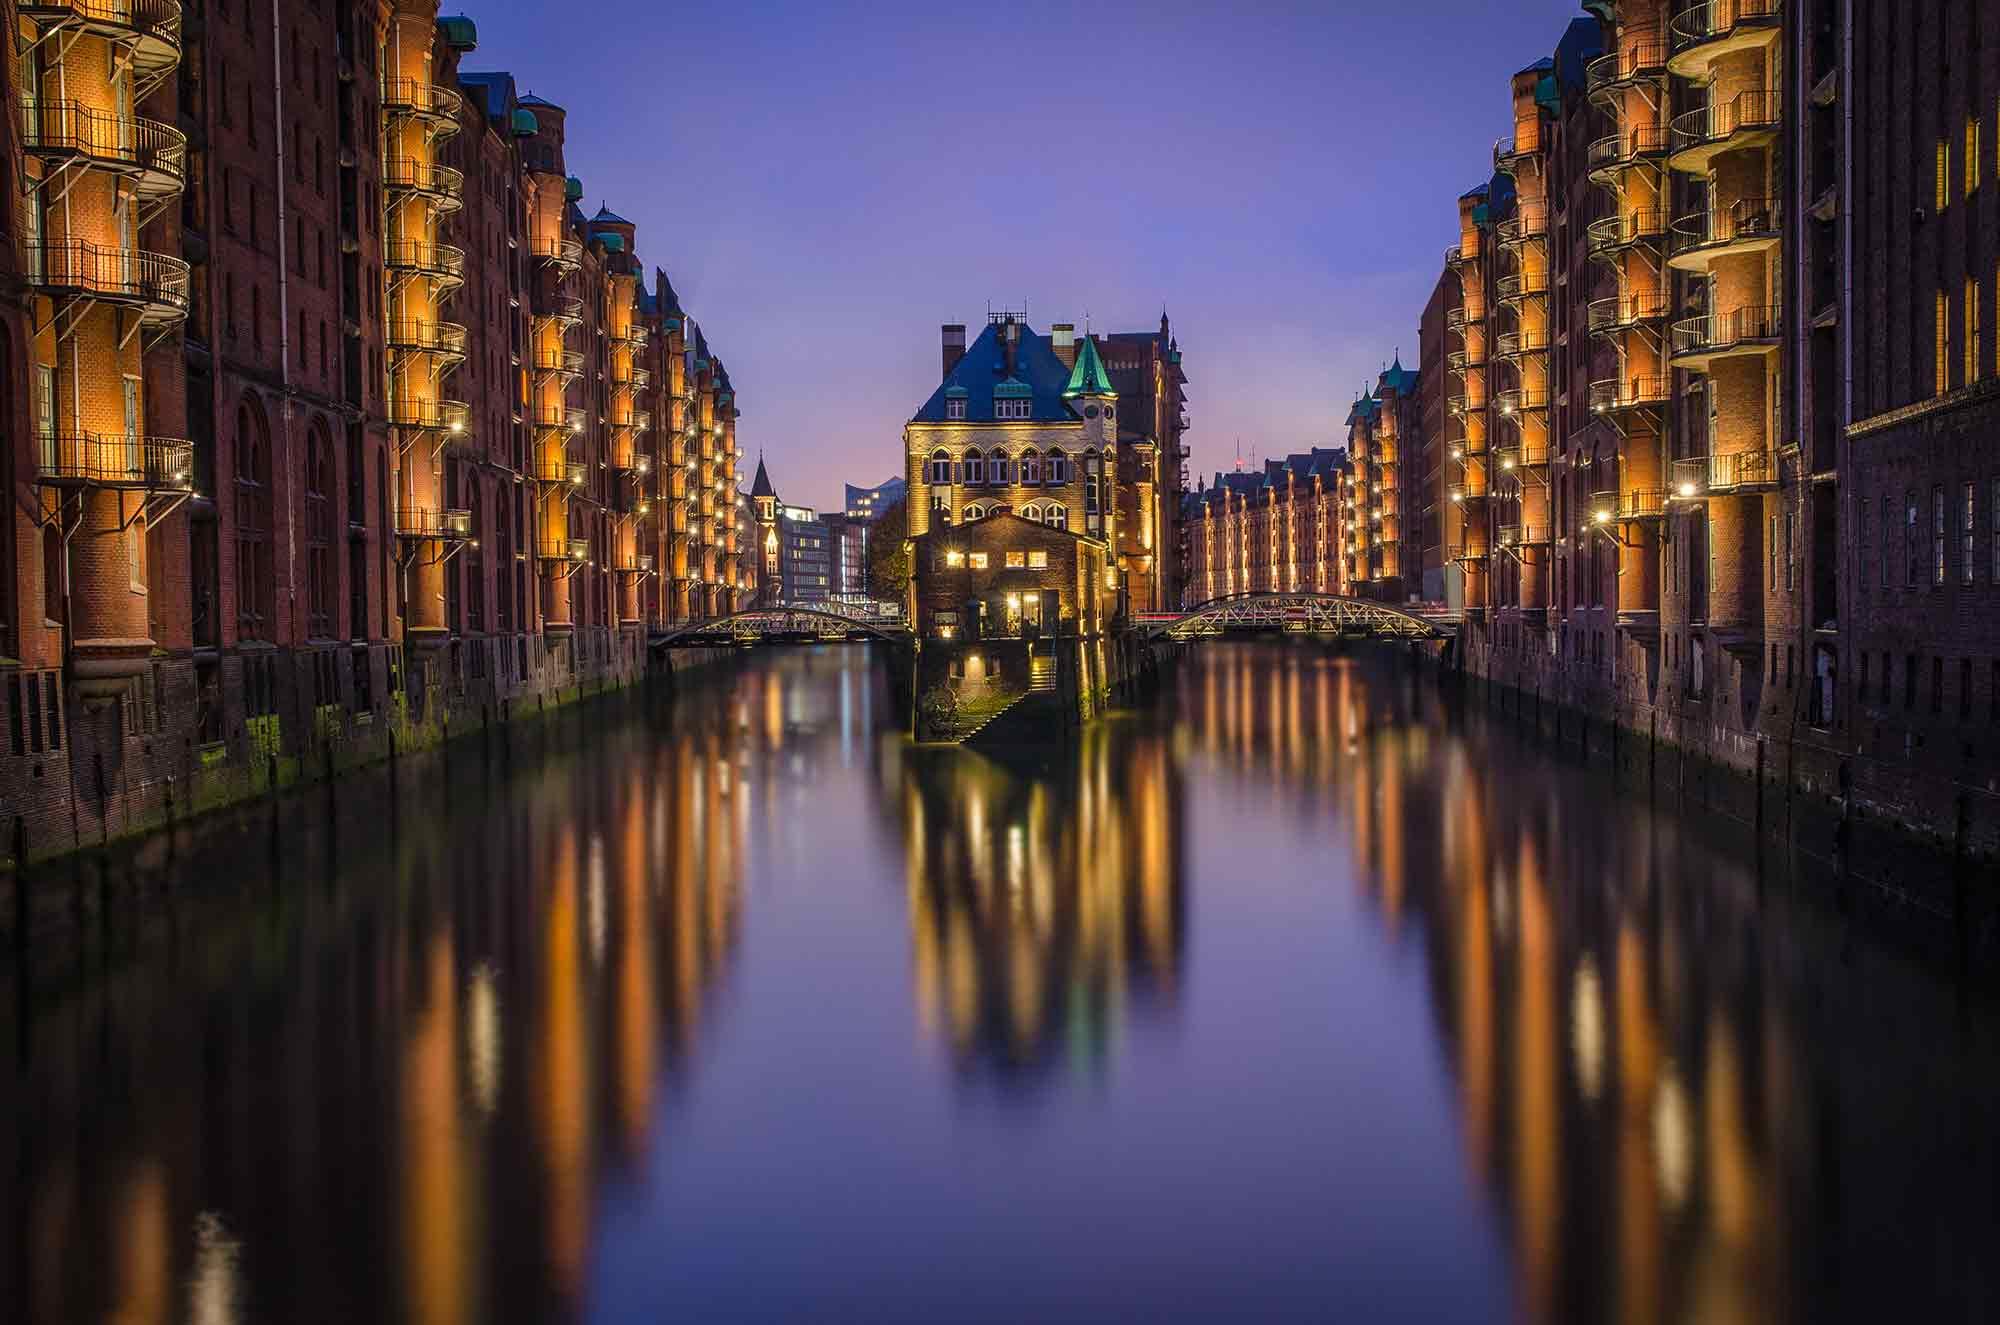 Wasserschloss-Hamburg-Bilder